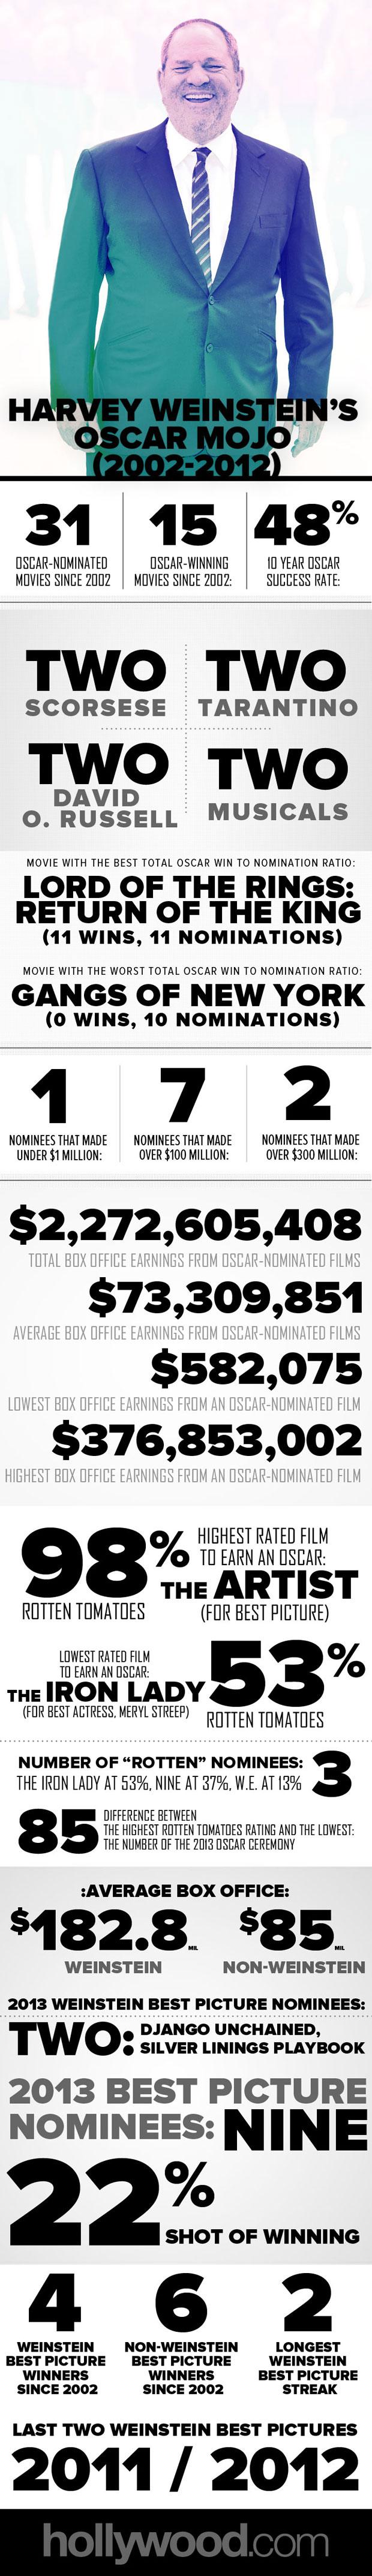 Harvey Weinstein Oscar History